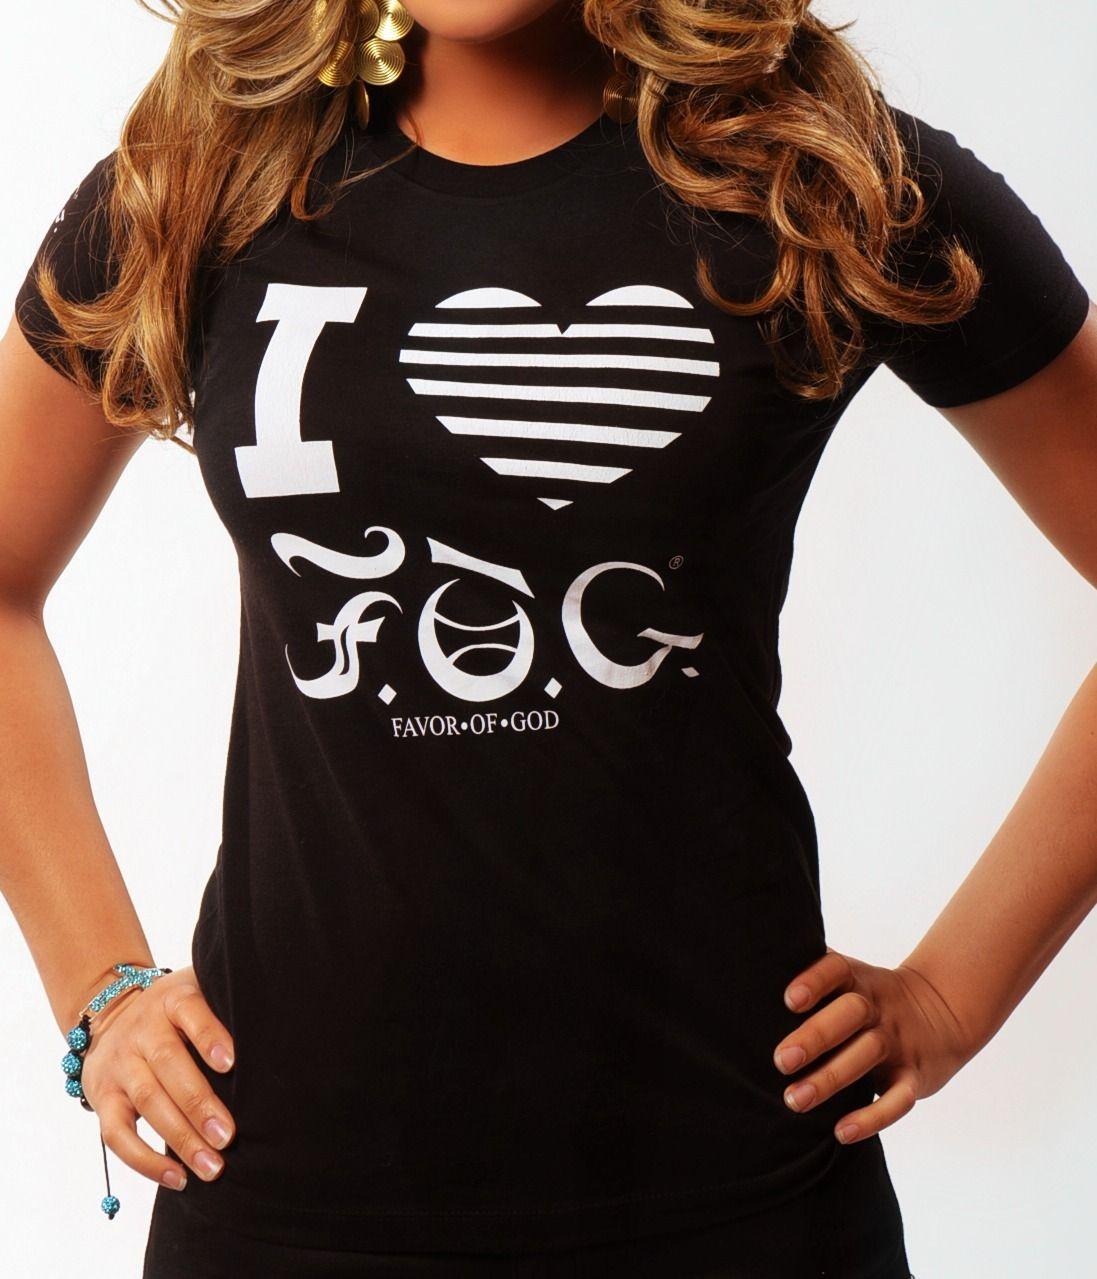 F.O.G. FAVOR OF GOD | ONLINE STORE  - F.O.G. I LOVE Christian T-Shirt - Black , $25.00 (http://www.fogcollection.com/f-o-g-i-love-christian-t-shirt-black/)